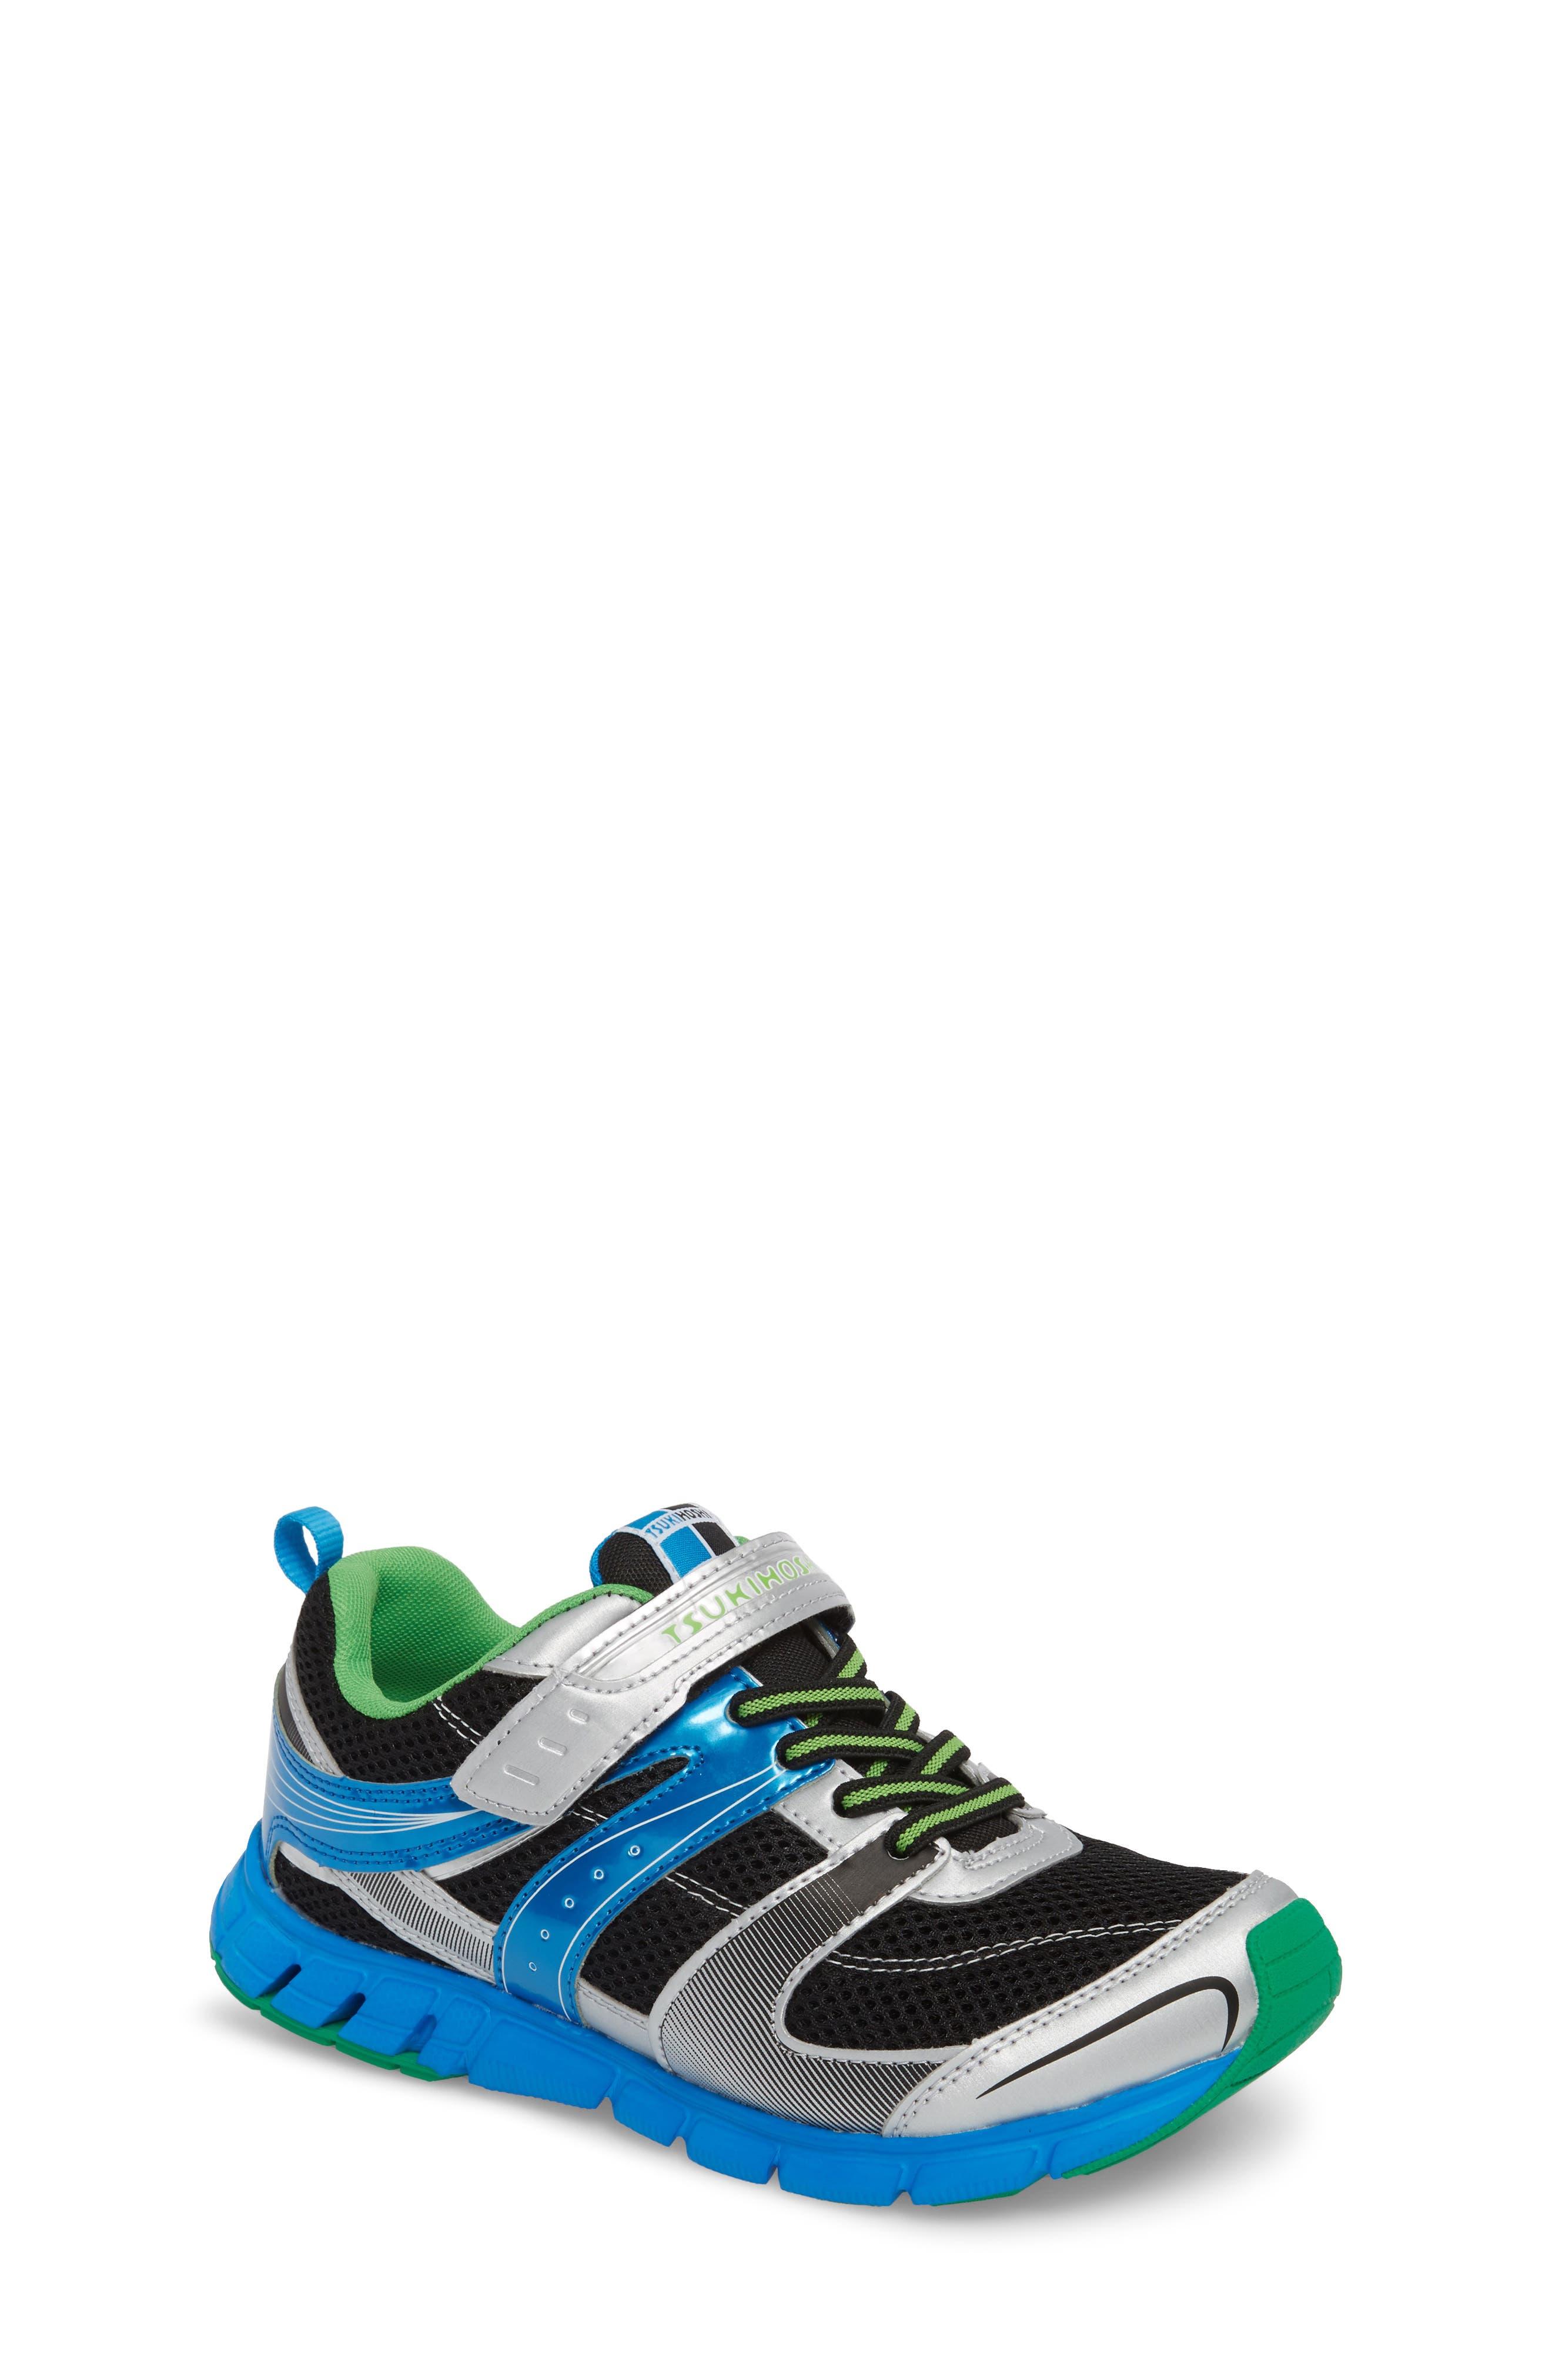 Tsukihoshi Velocity Washable Sneaker (Walker, Toddler, Little Kid & Big Kid)